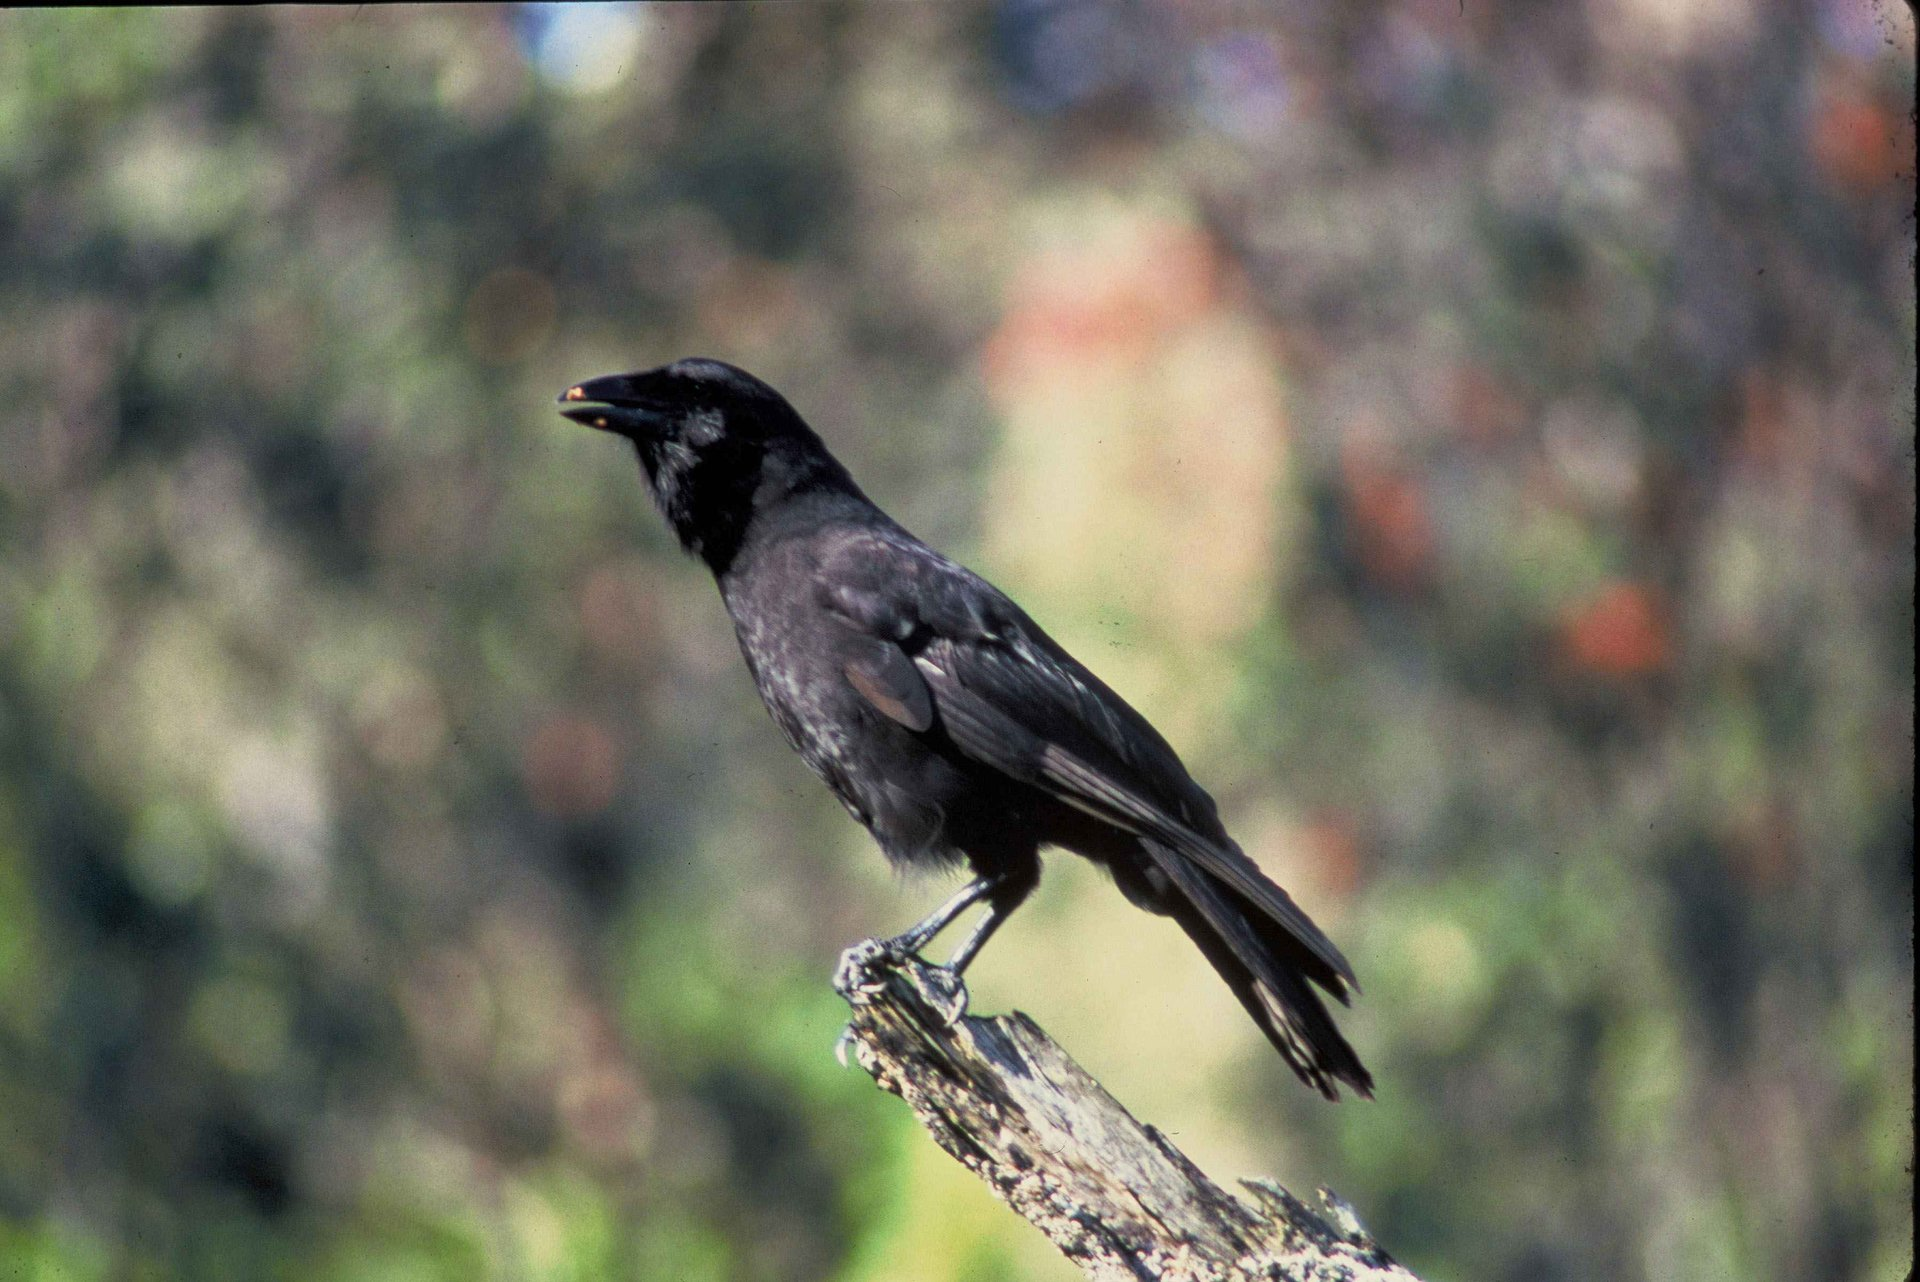 Birdwatching in Hawaii 2020 - Best Time